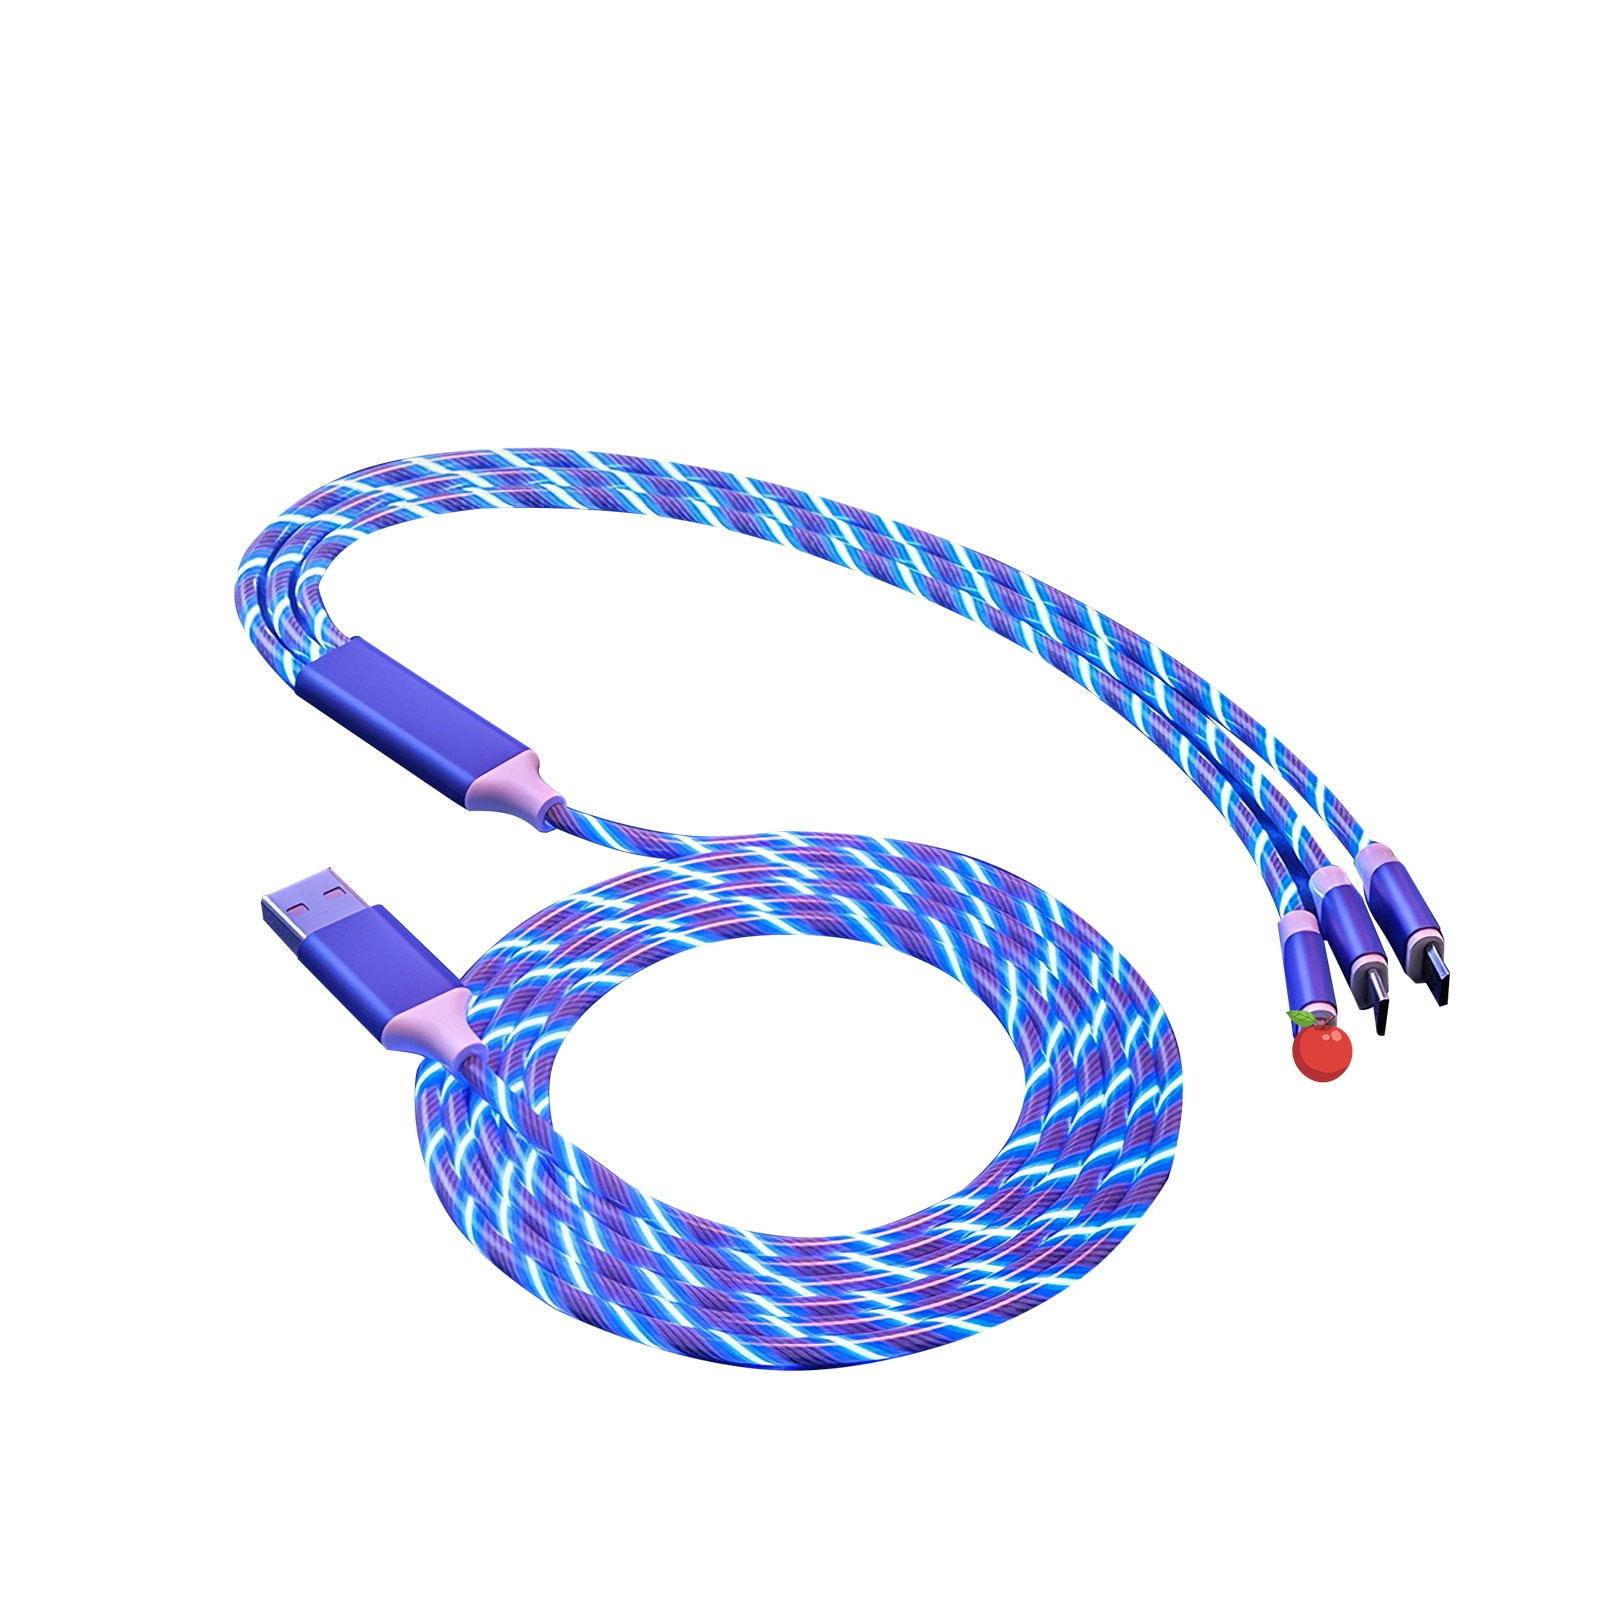 Cable de carga tipo C 3 en 1, Cable USB LED luminoso,...